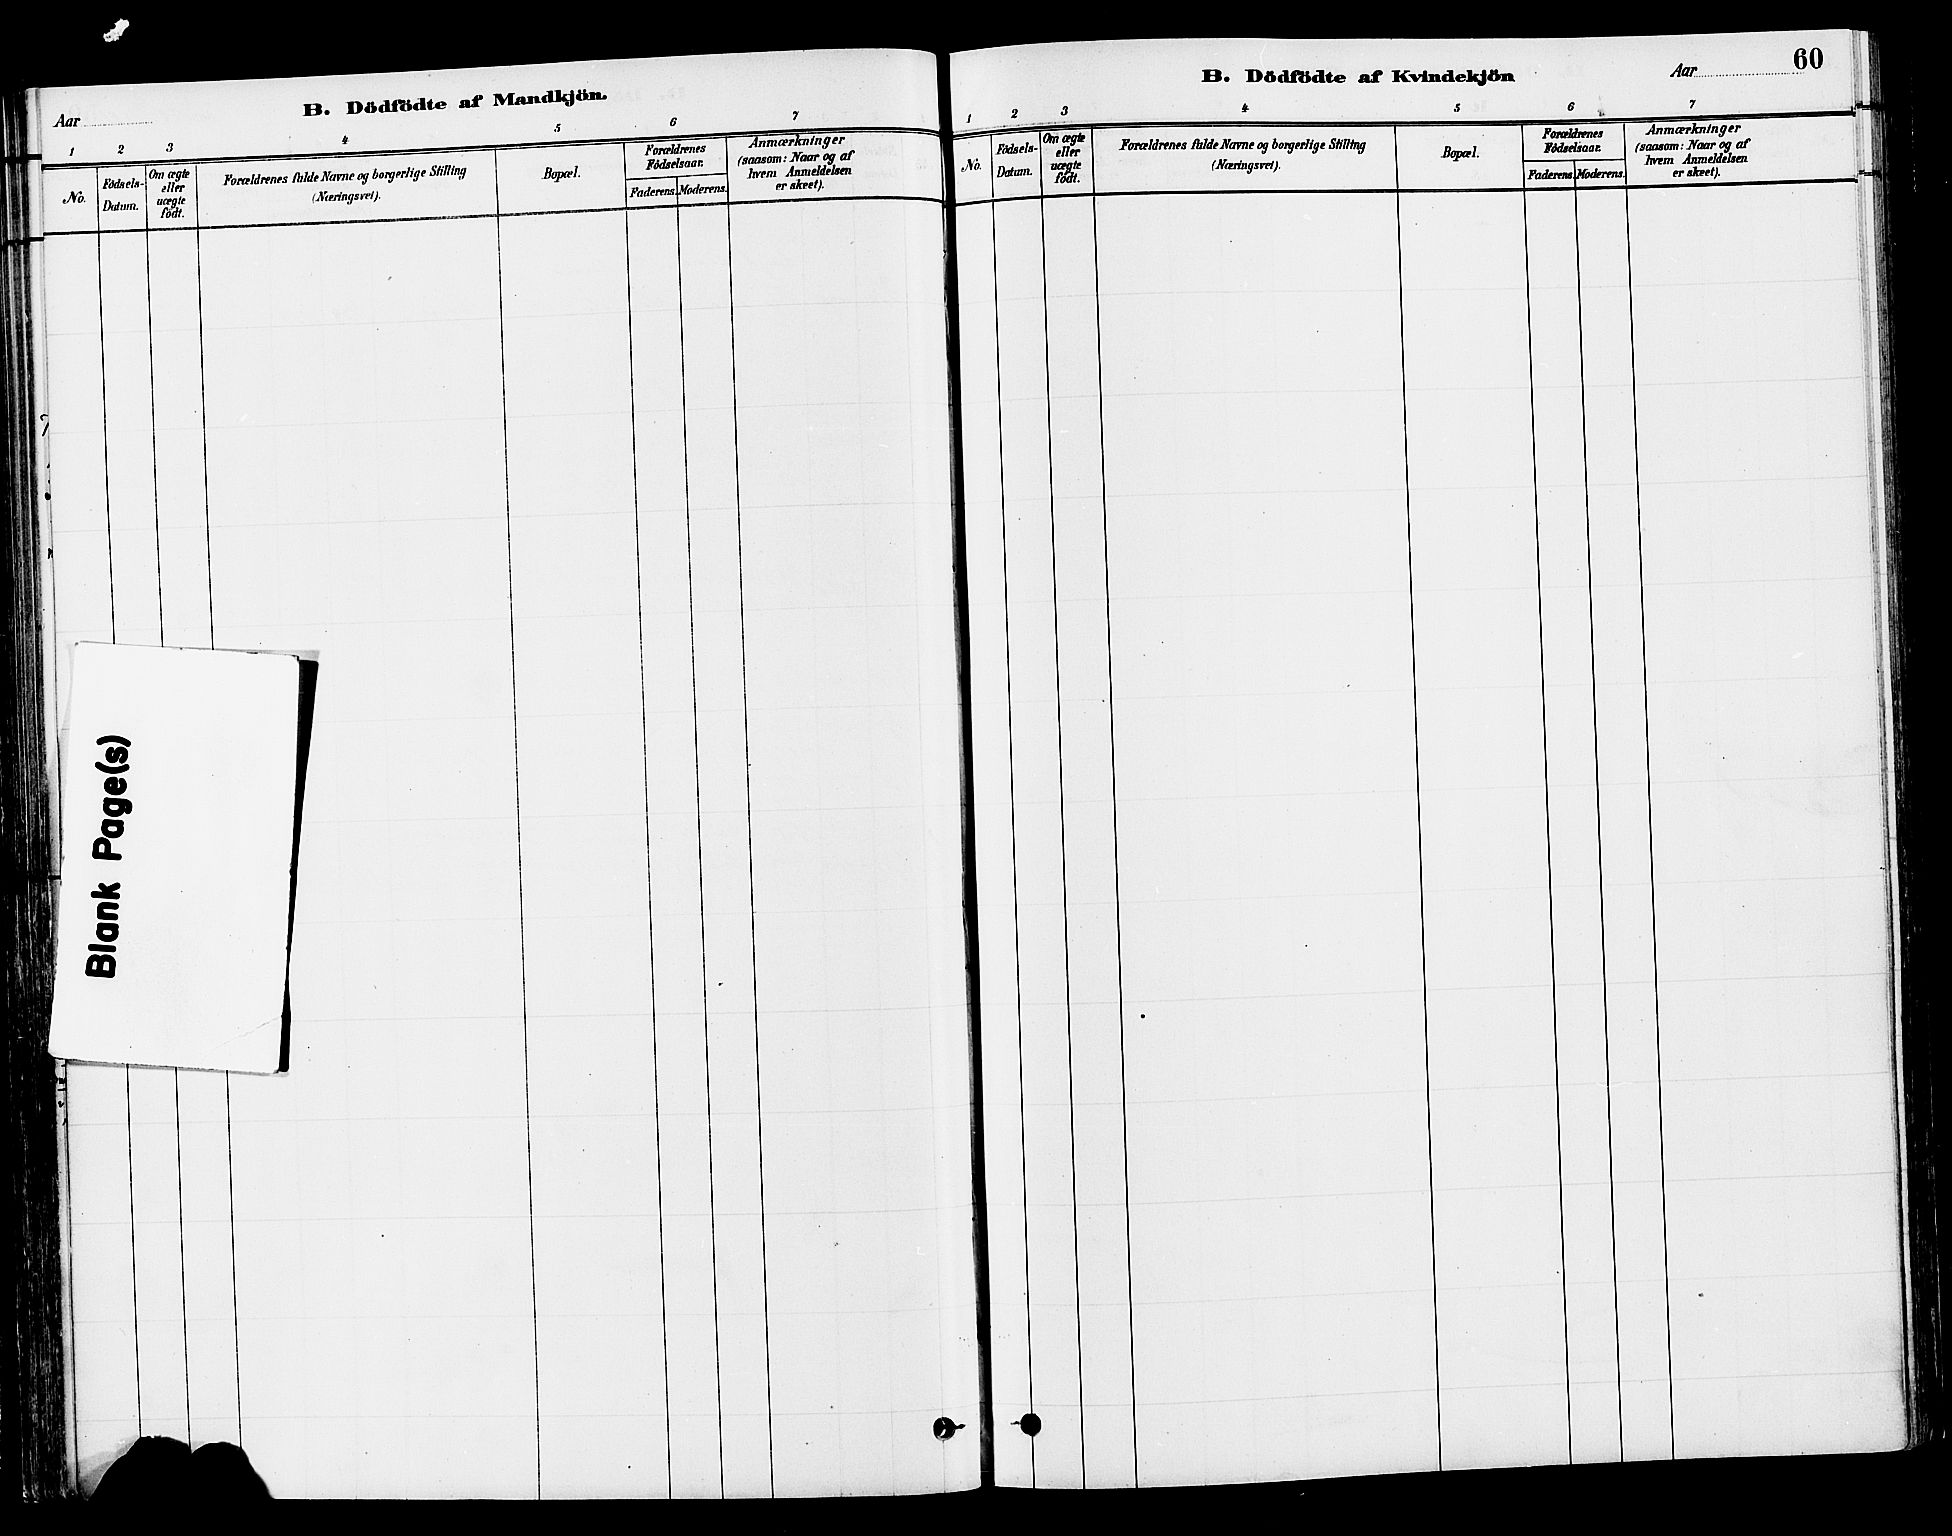 SAH, Gran prestekontor, Ministerialbok nr. 15, 1880-1888, s. 60